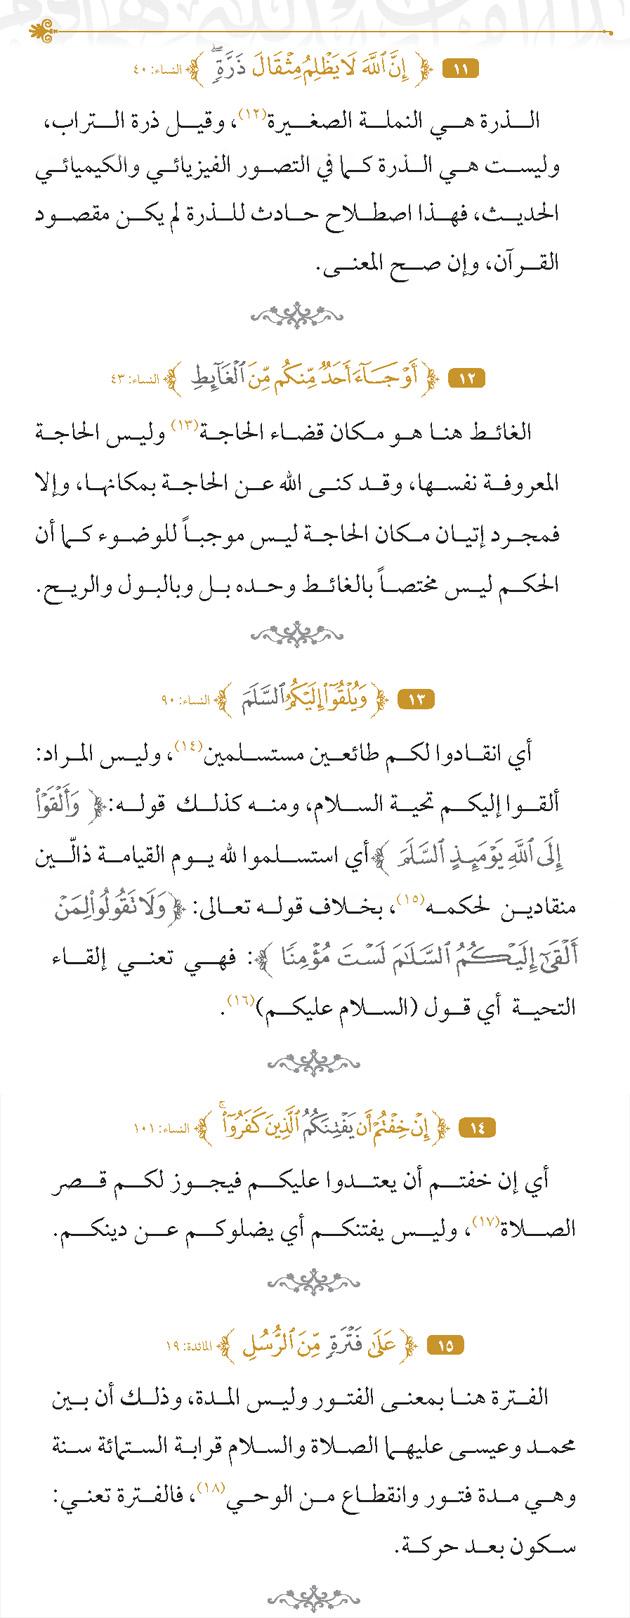 akhawat_islamway_1392761290__11-15.jpg